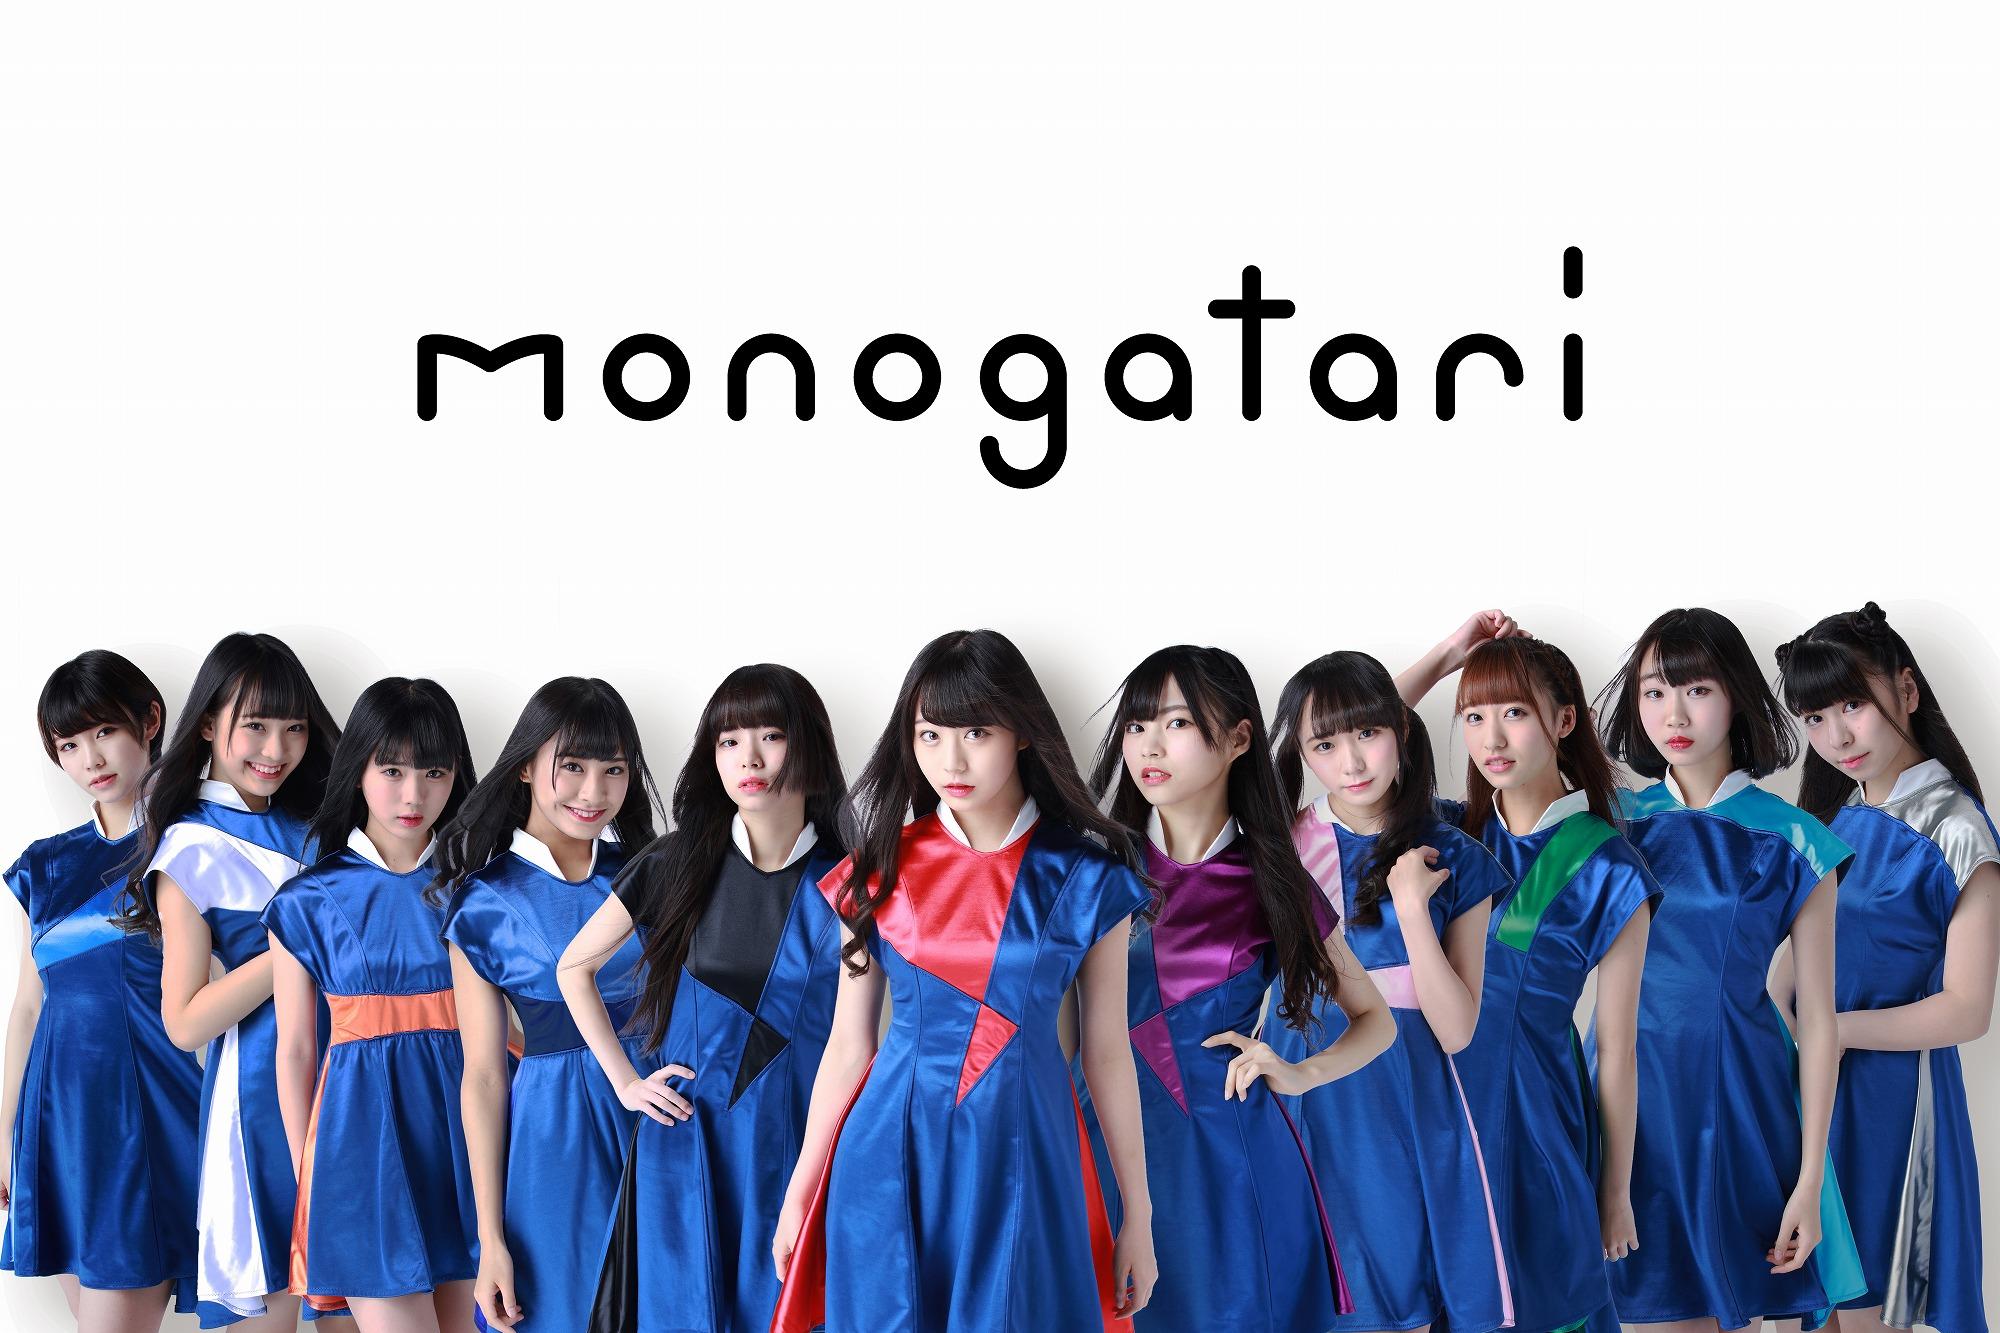 monogatari ニューシングル「もう一回君に好きといえない」発売記念イベント